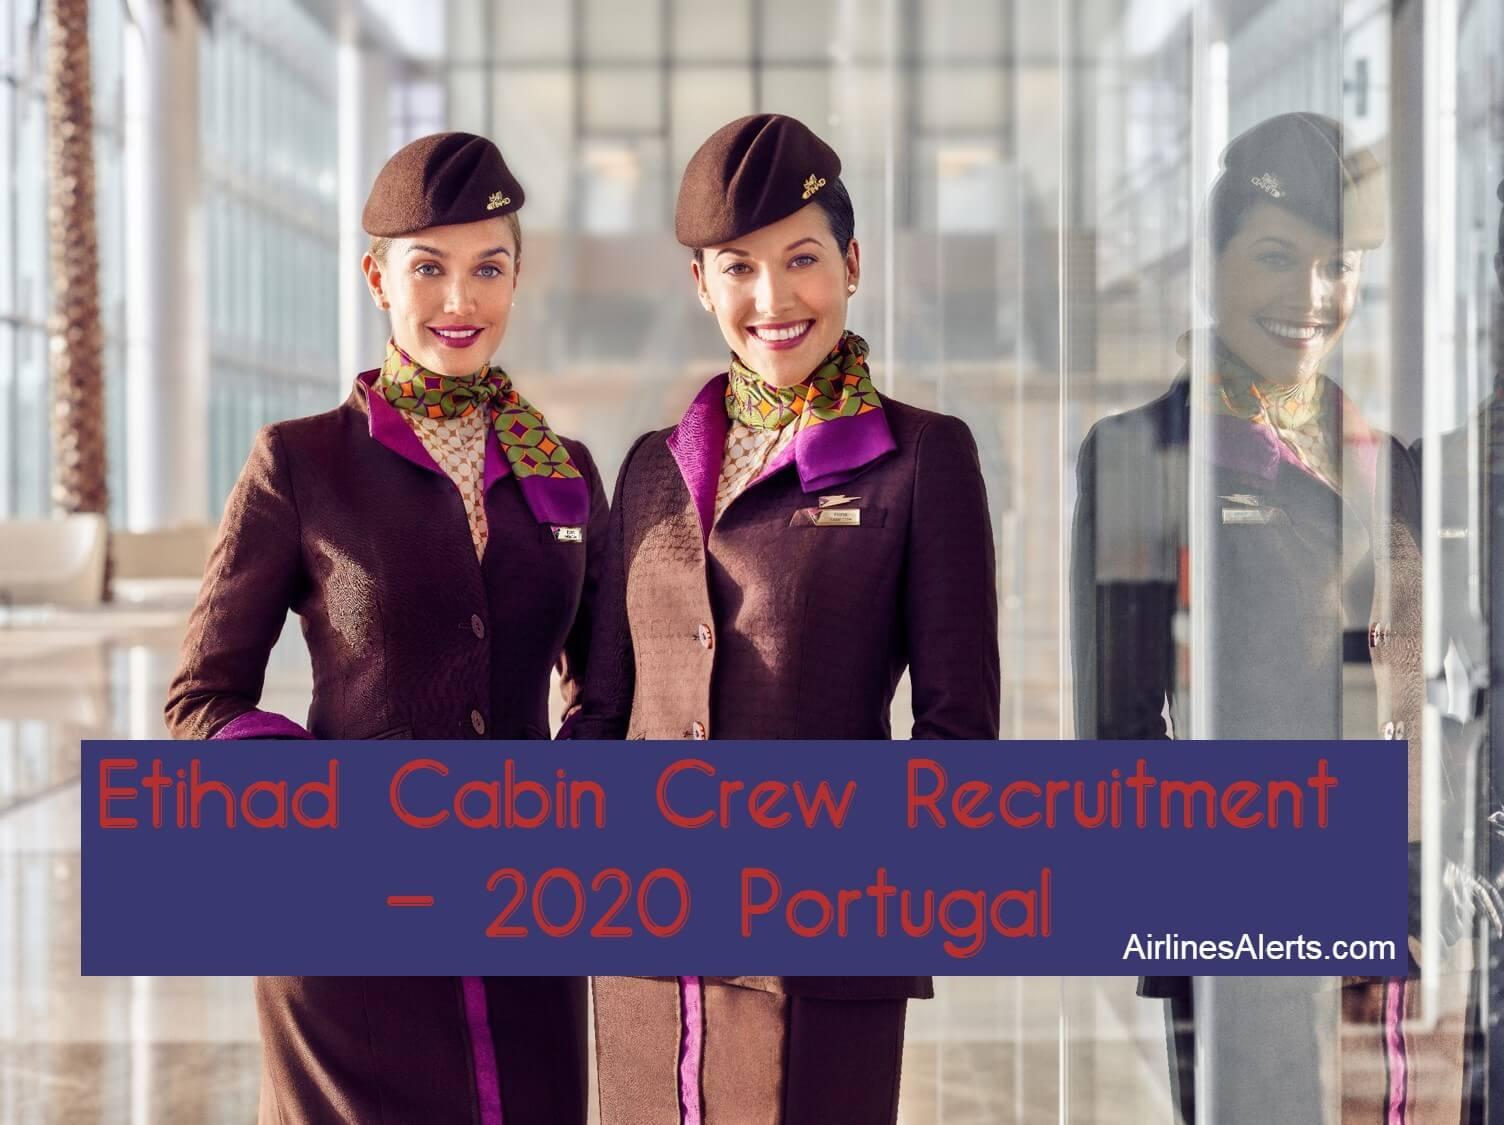 Etihad Cabin Crew Recruitment Portugal 2020 ( Lisbon Centre)